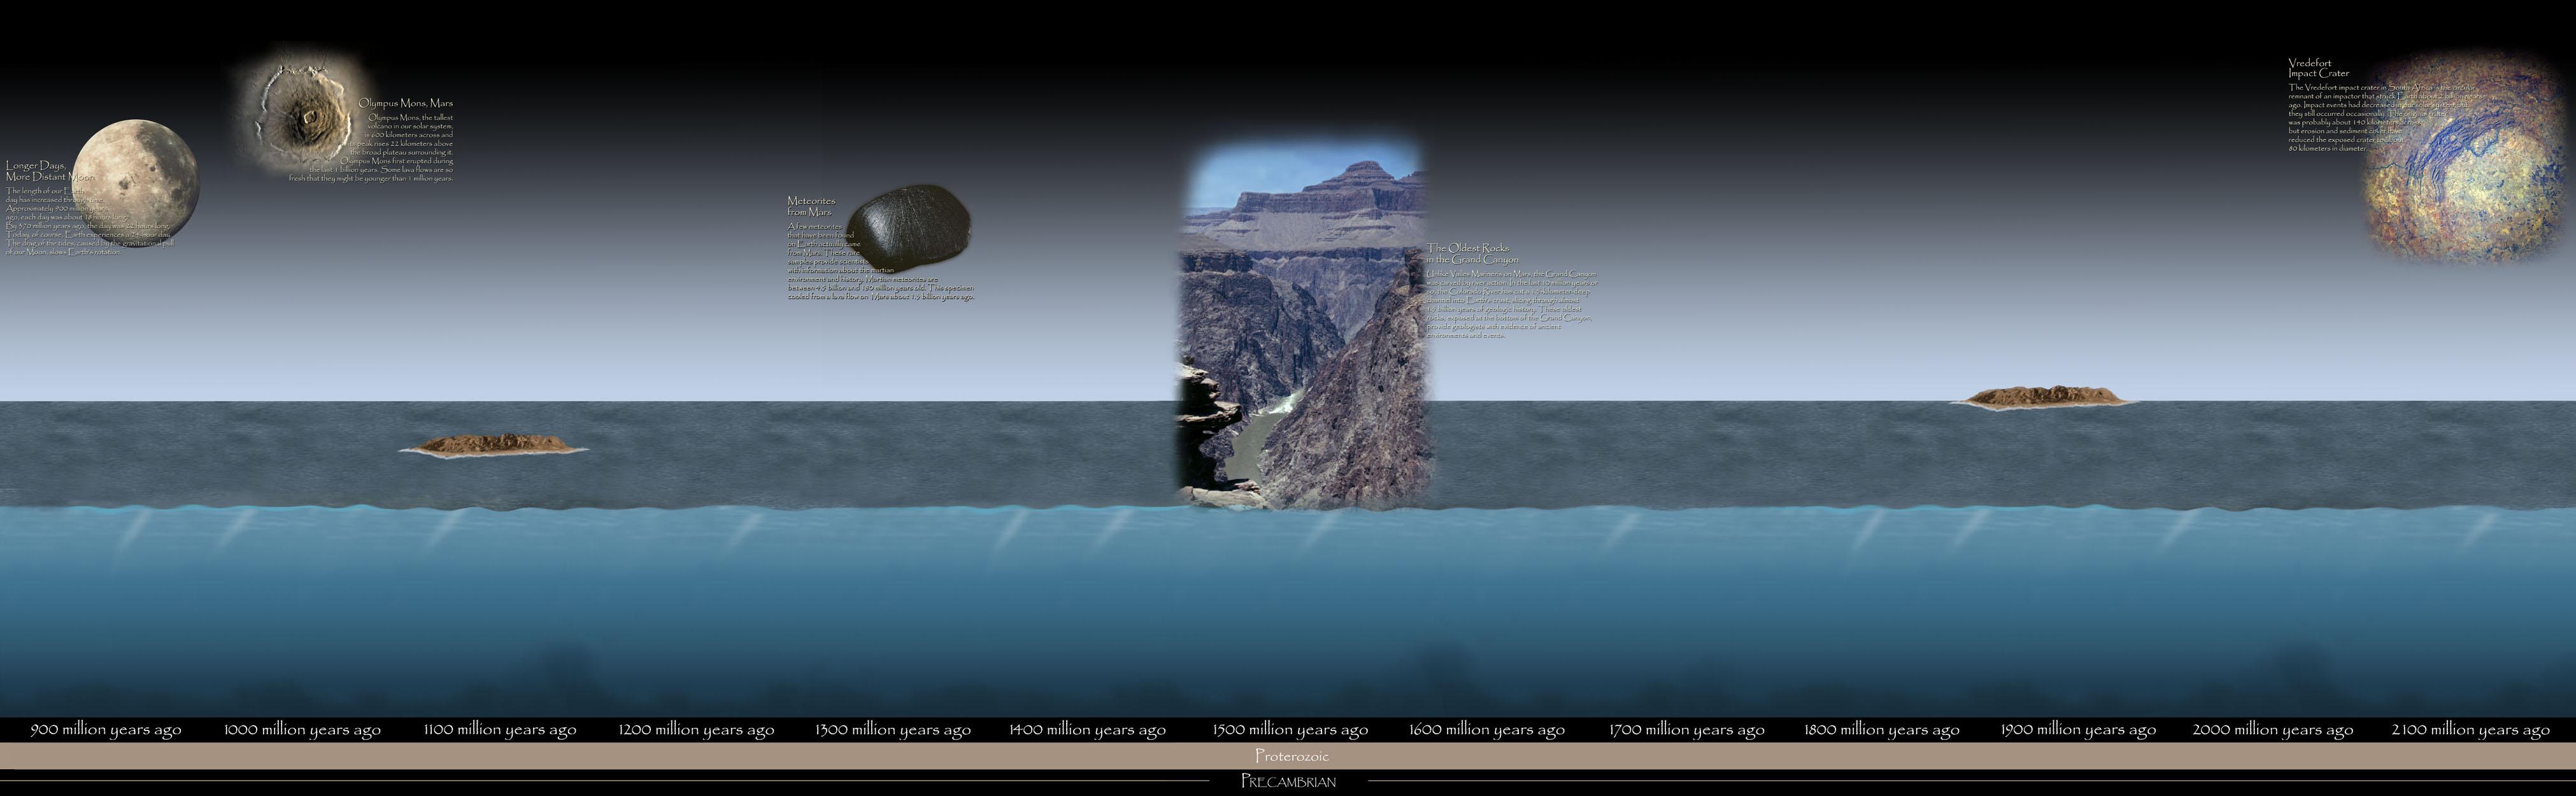 history-of-earth-2